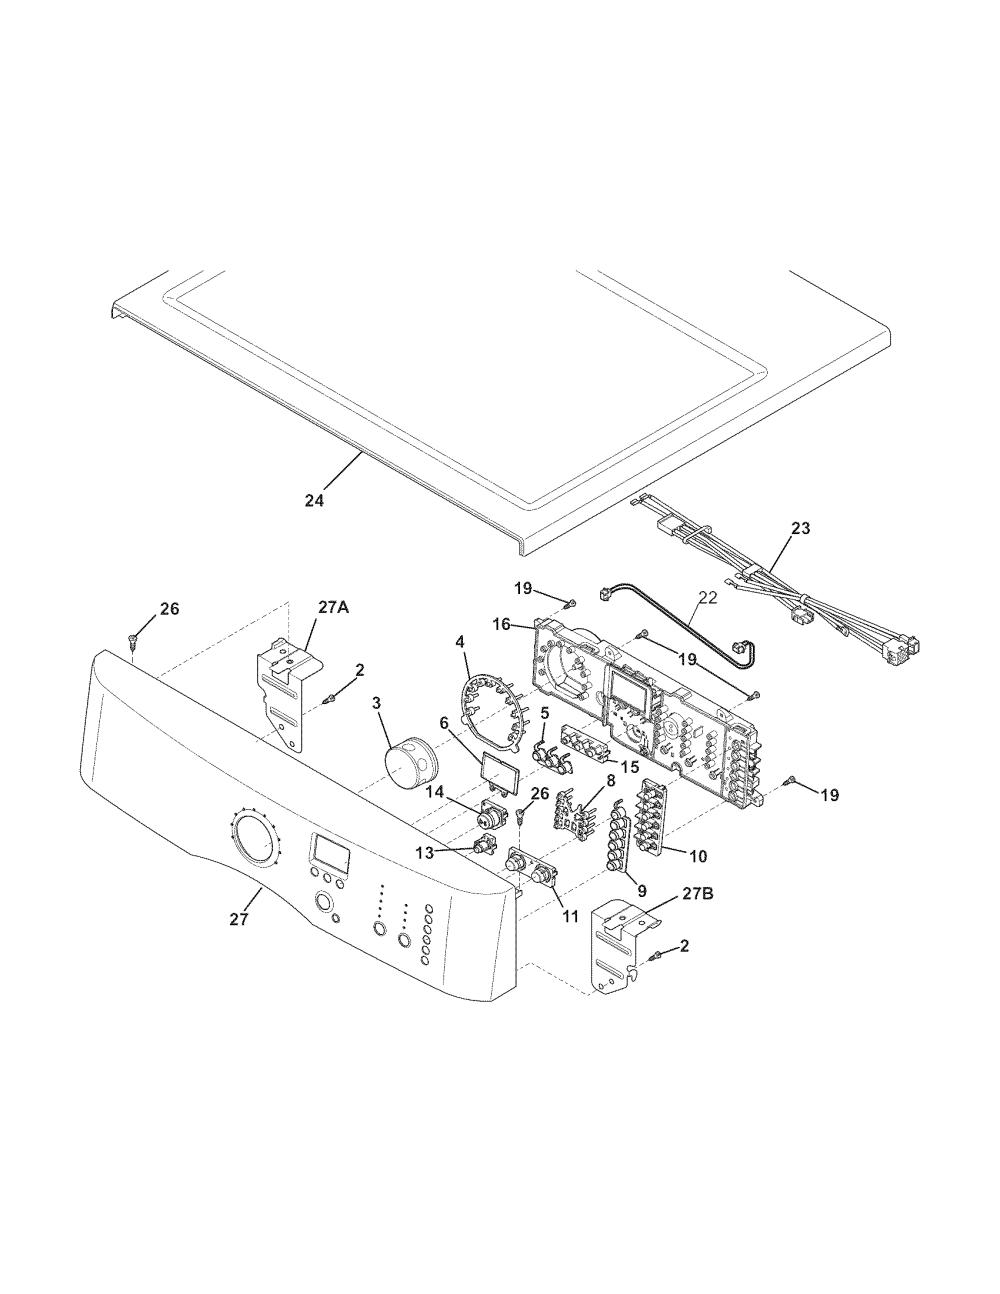 medium resolution of electrolux electric dryer motor parts model eied55irr0 electrolux dryer wiring diagram